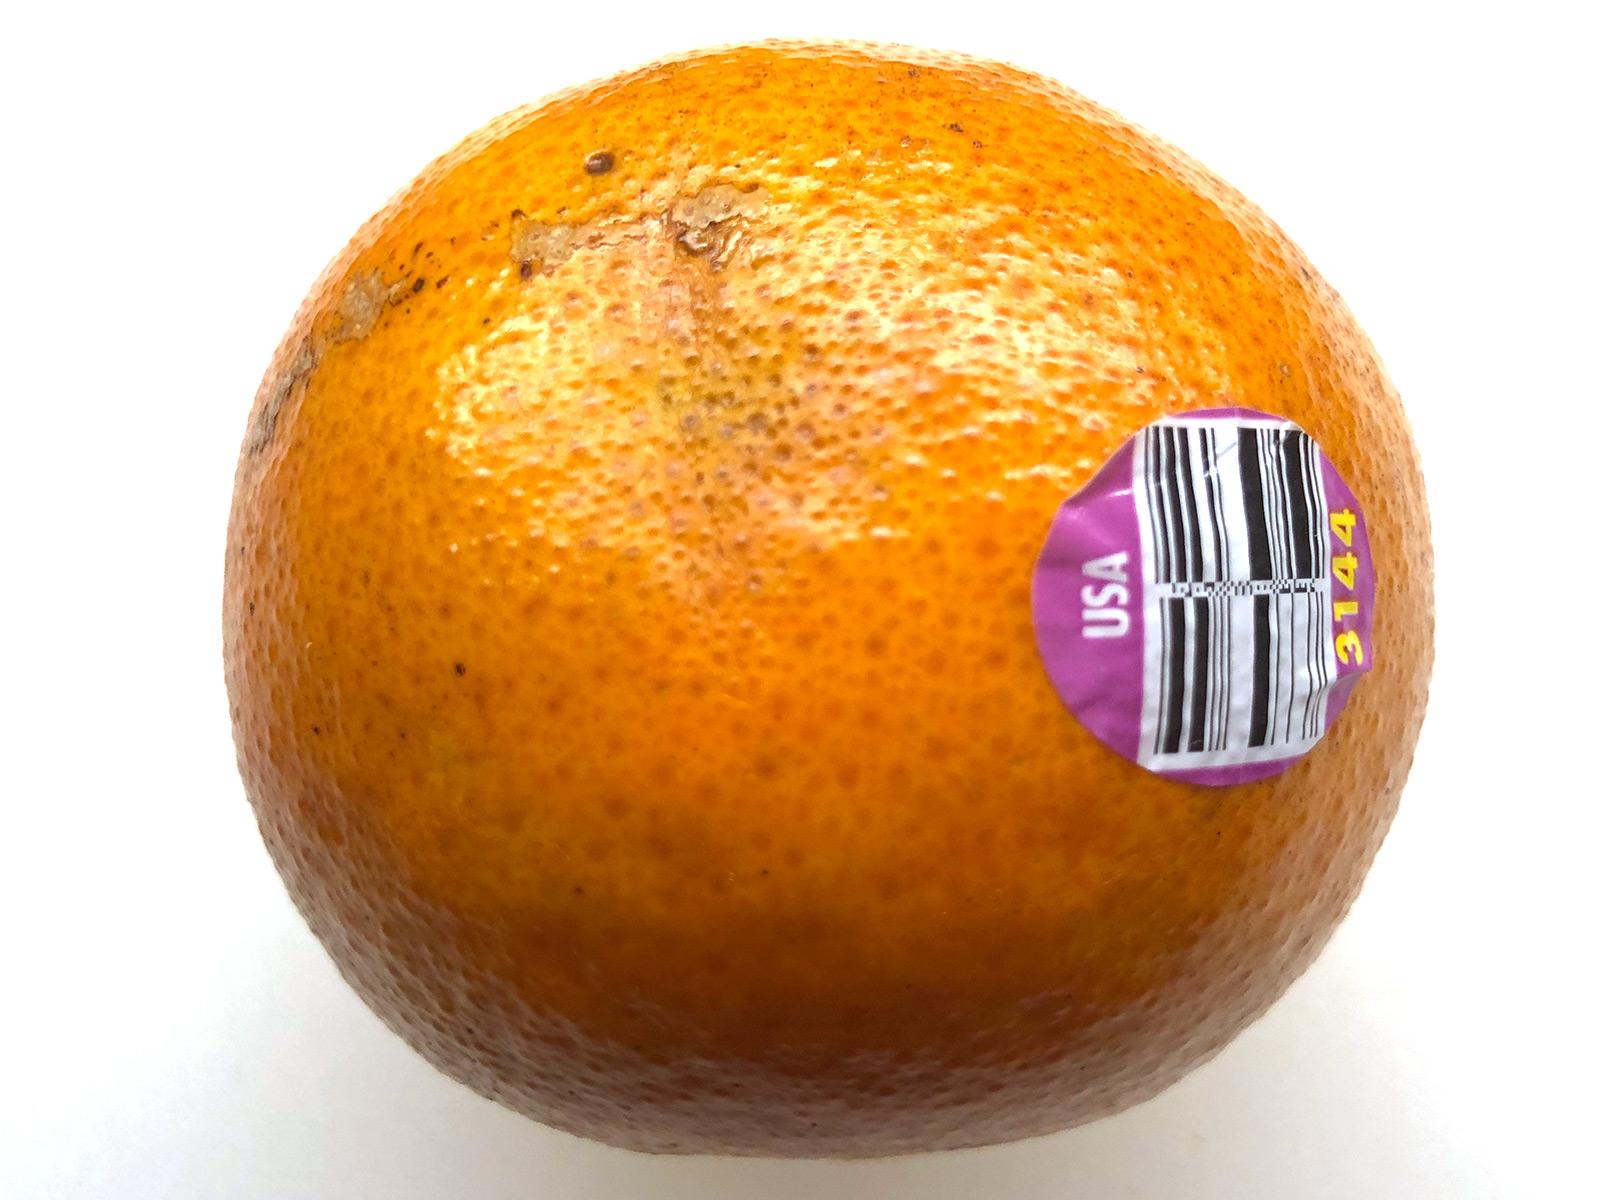 3144-fall-glo-tangerine.jpg